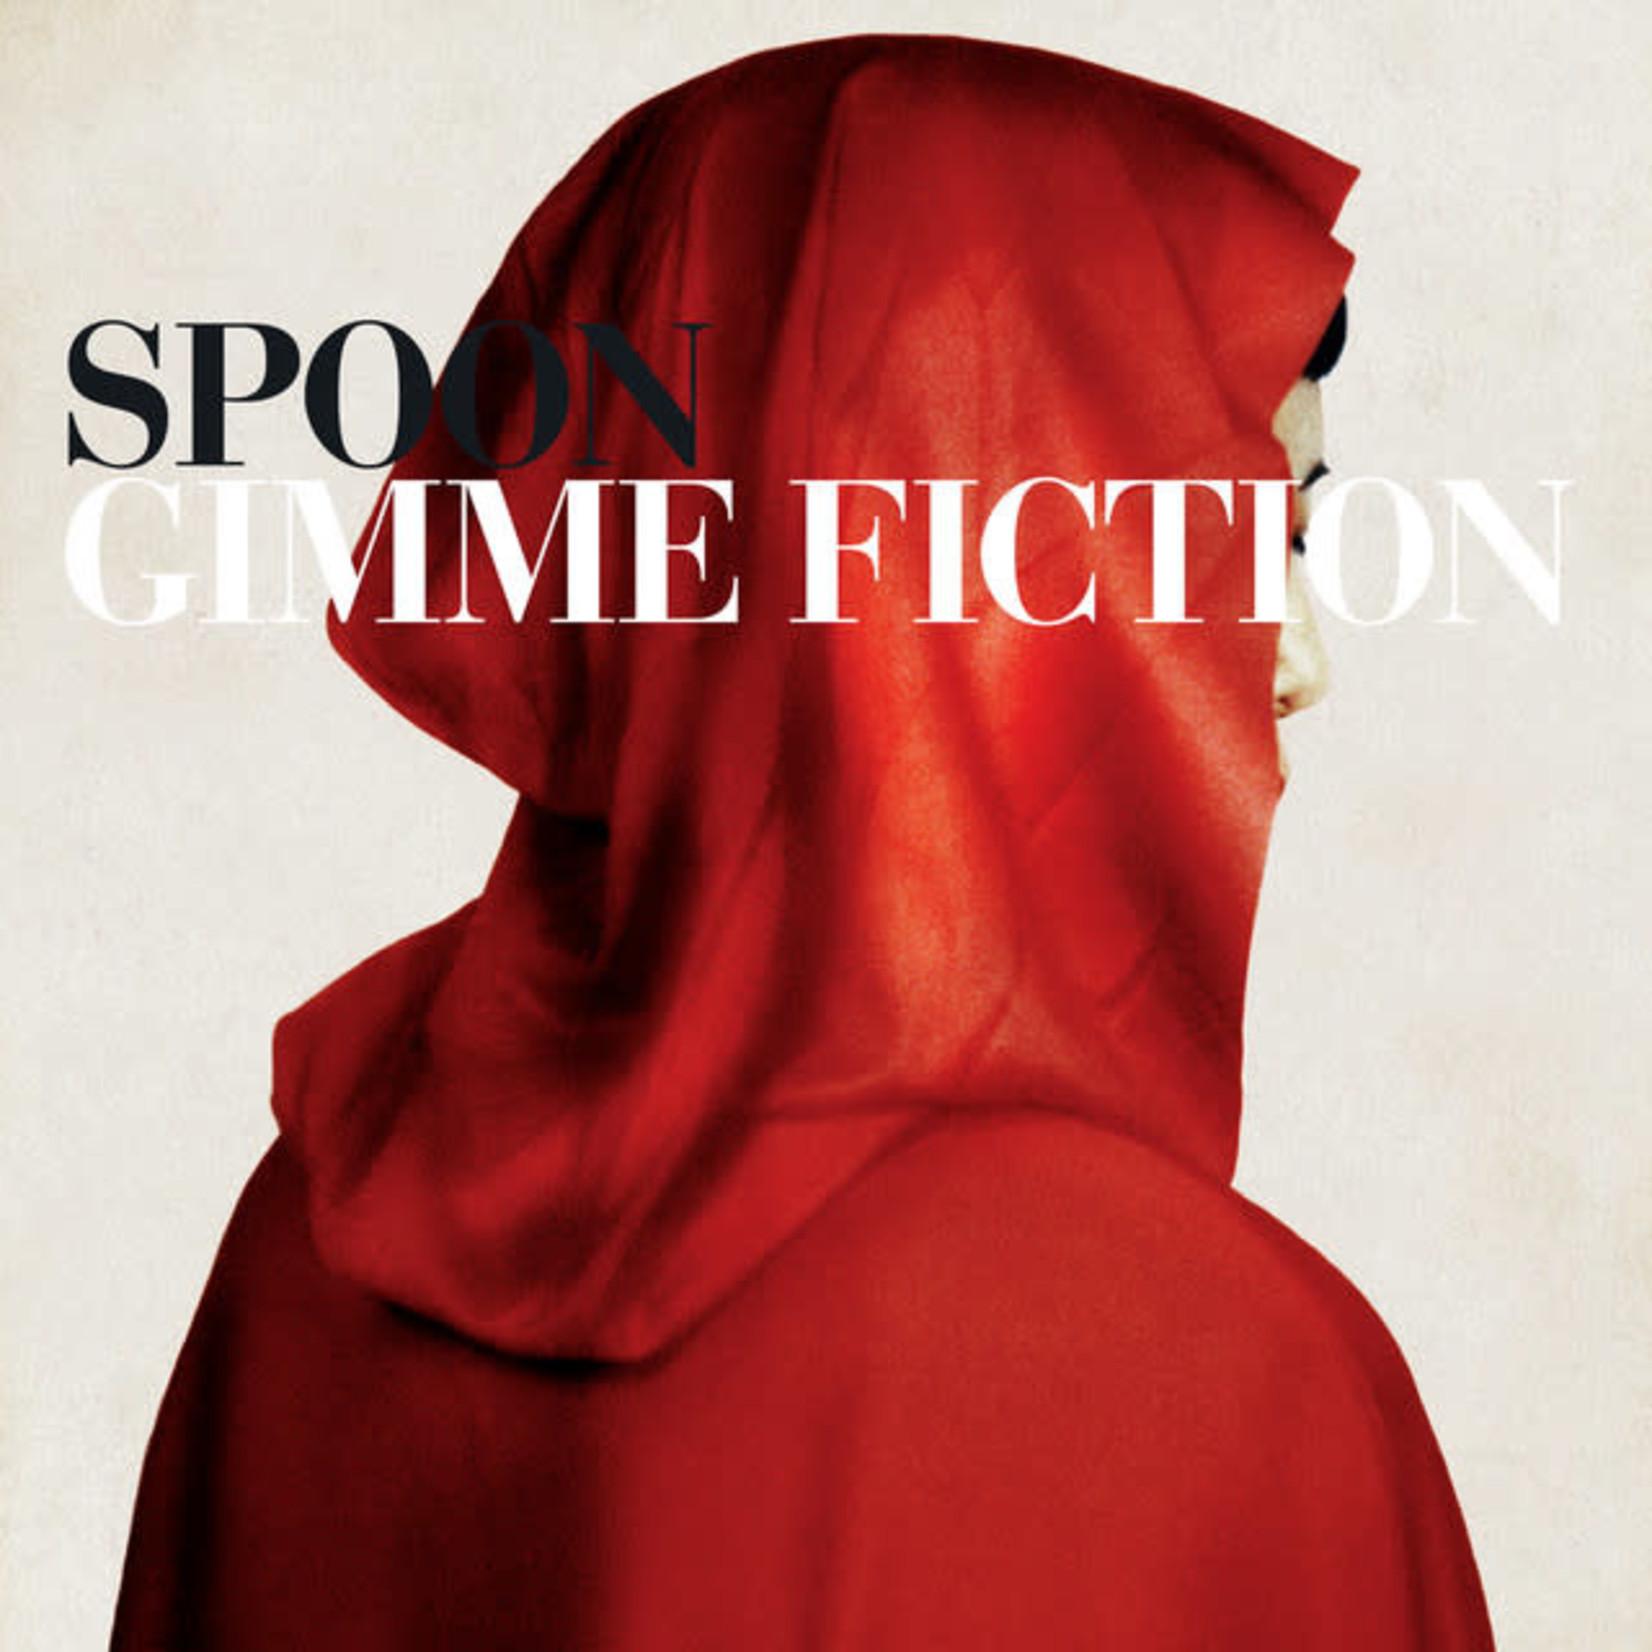 Vinyl Spoon - Gimme Fiction